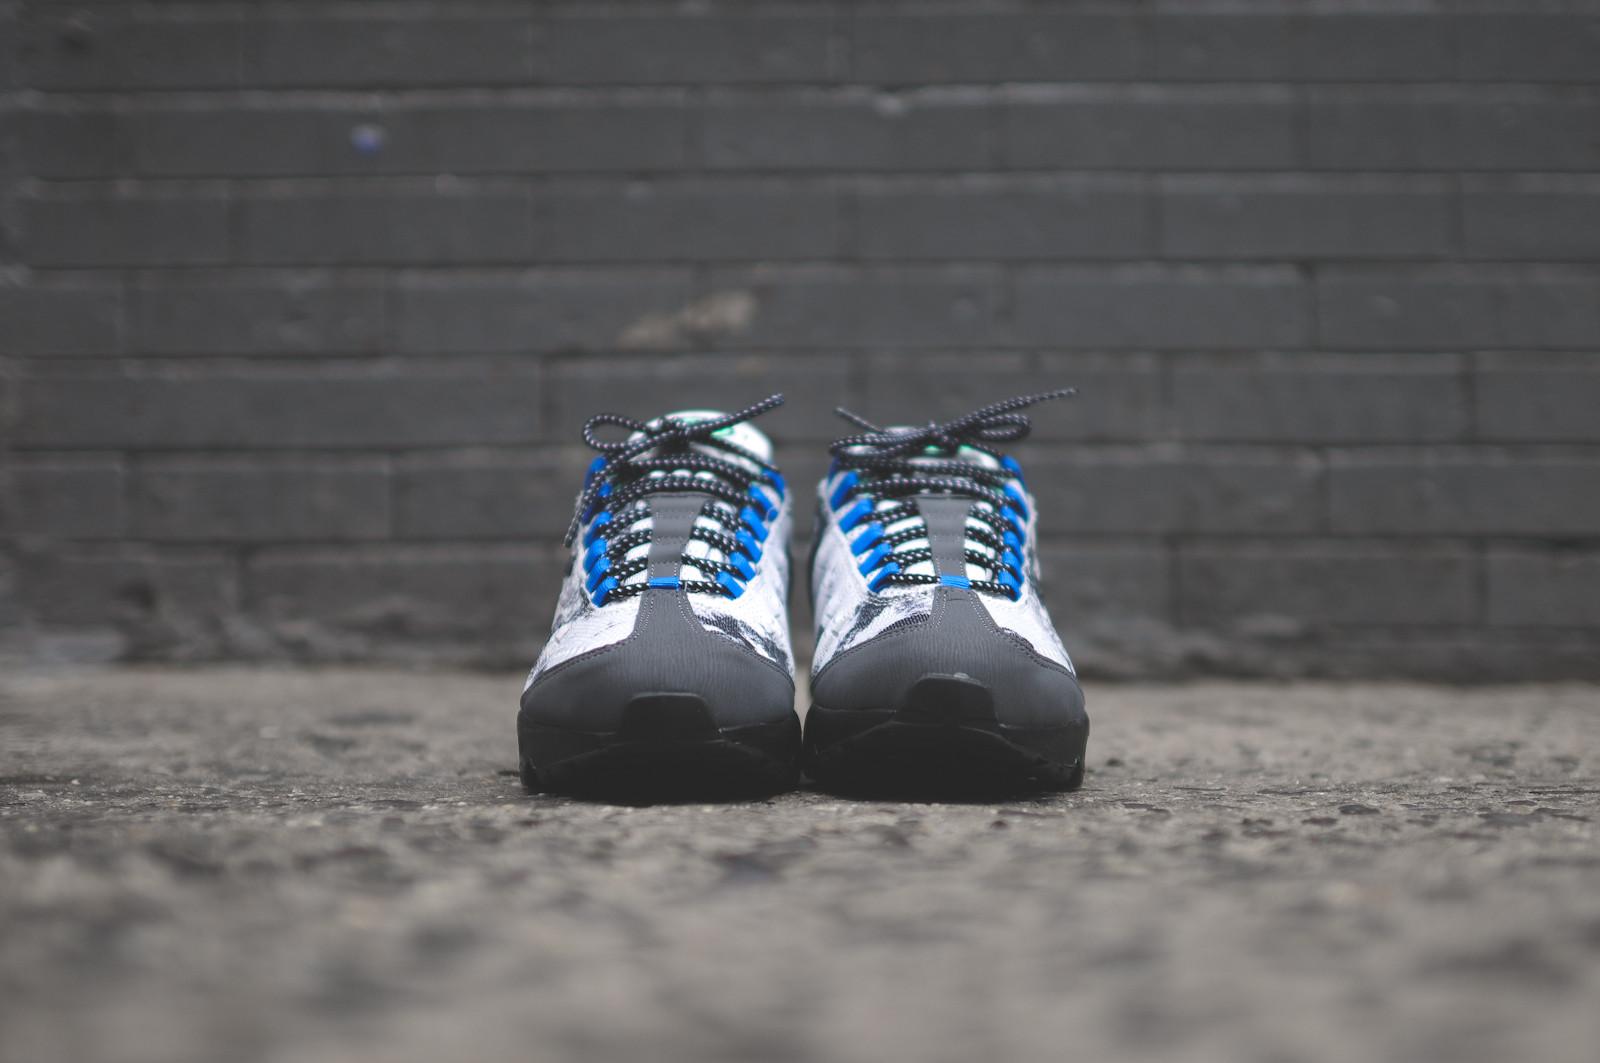 Nike Air Max 95 EM